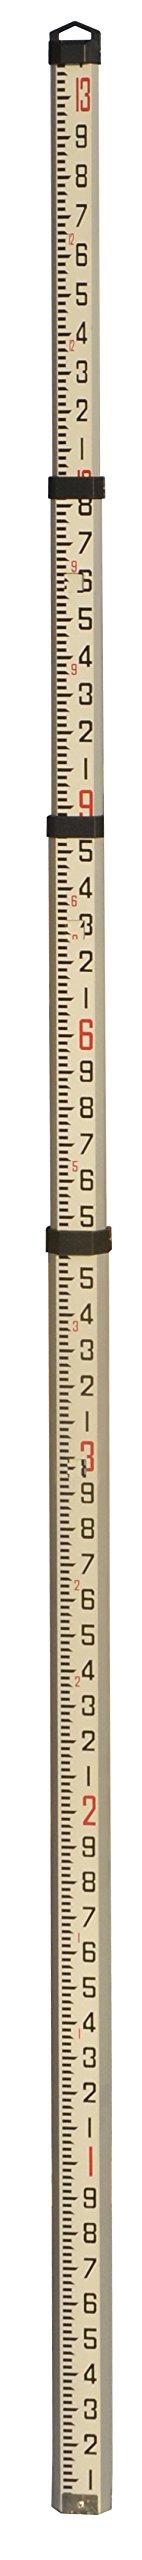 Johnson Level & Tool 40-6310 13' Grade Rod,